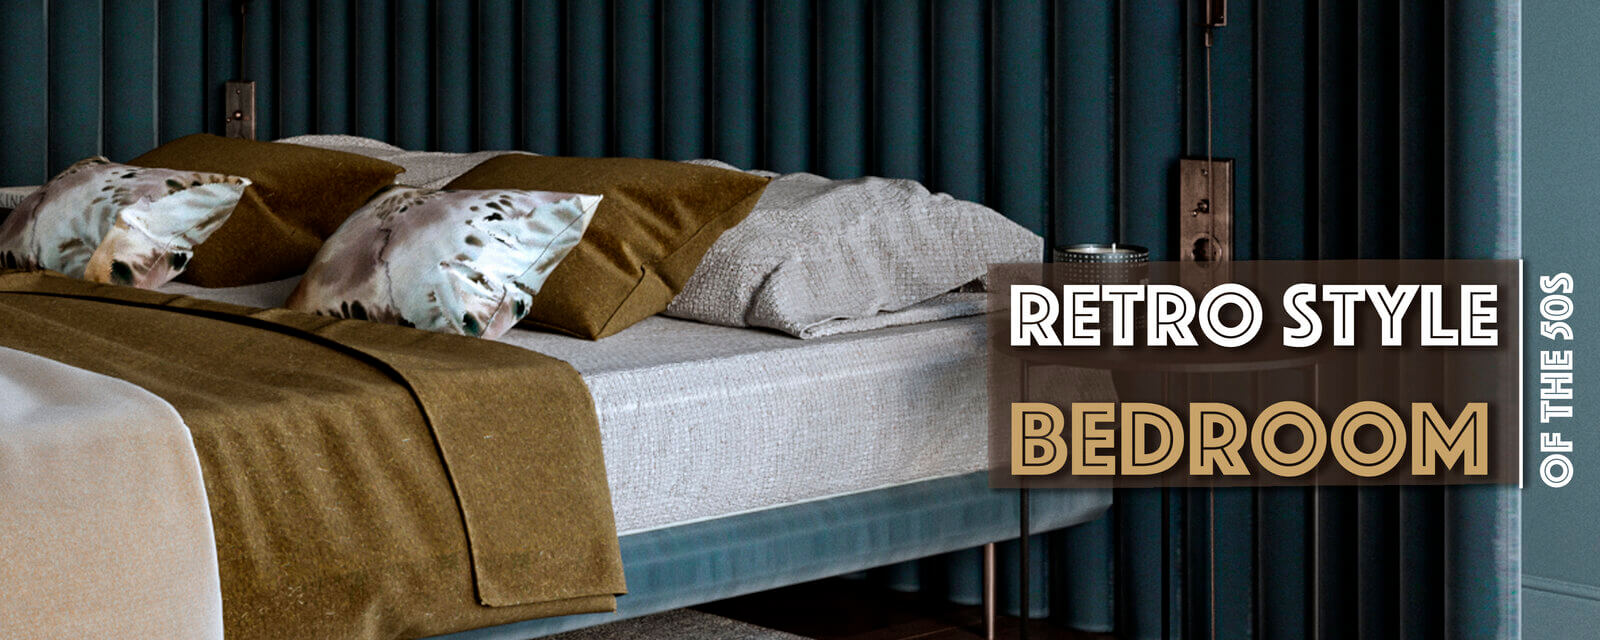 Retro Style Of the 50s | Bedroom